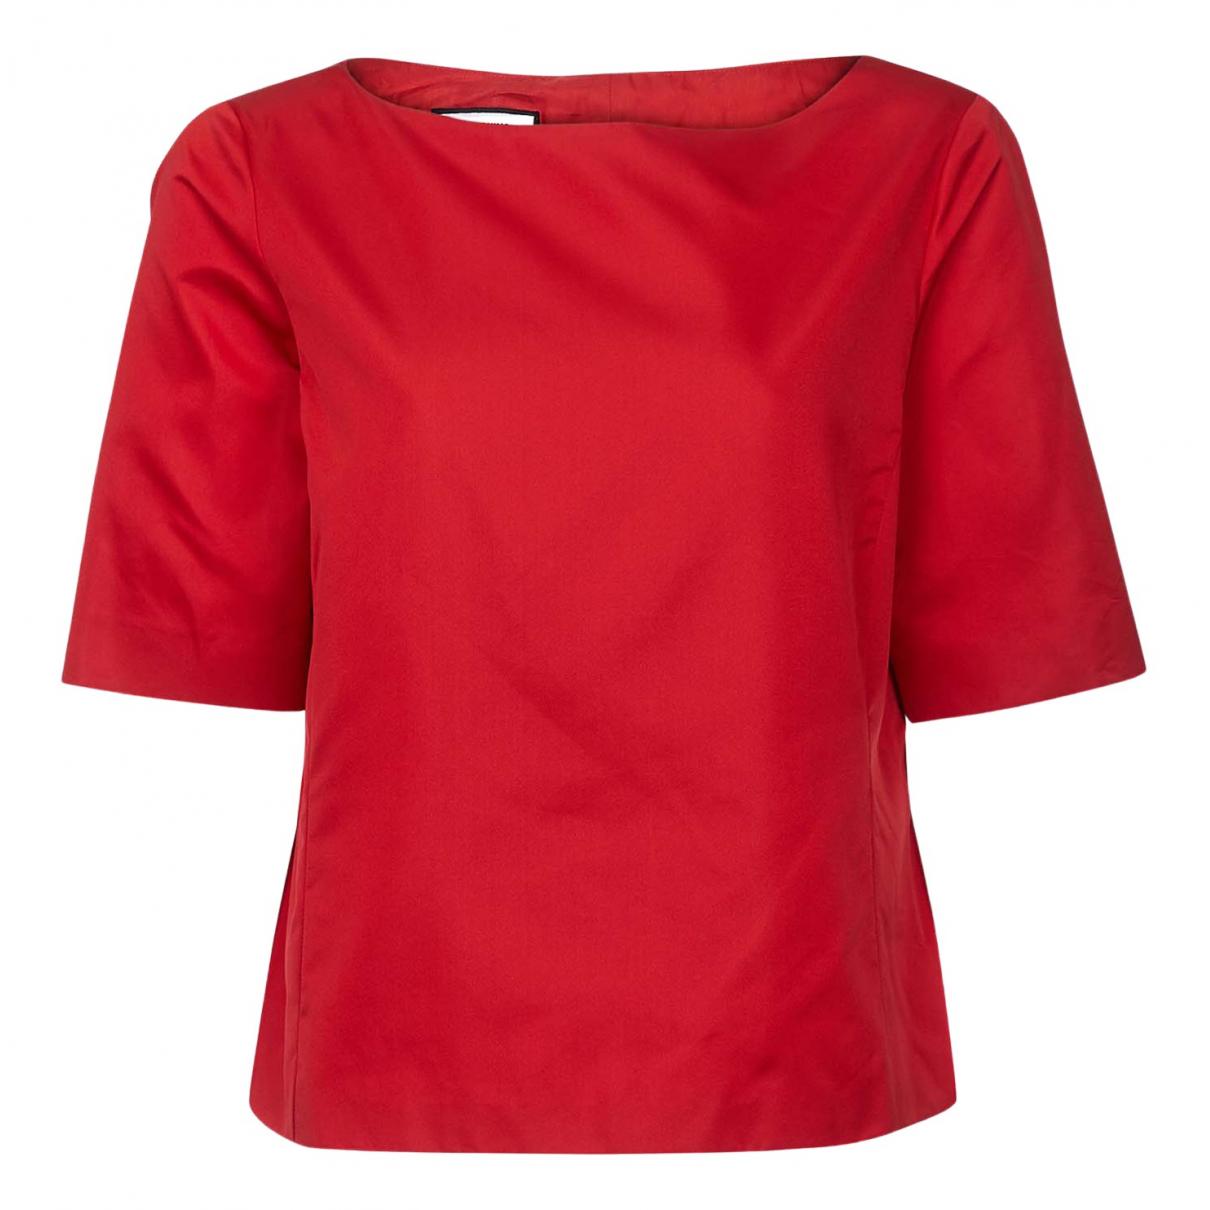 Moschino N Red Silk  top for Women 14 UK